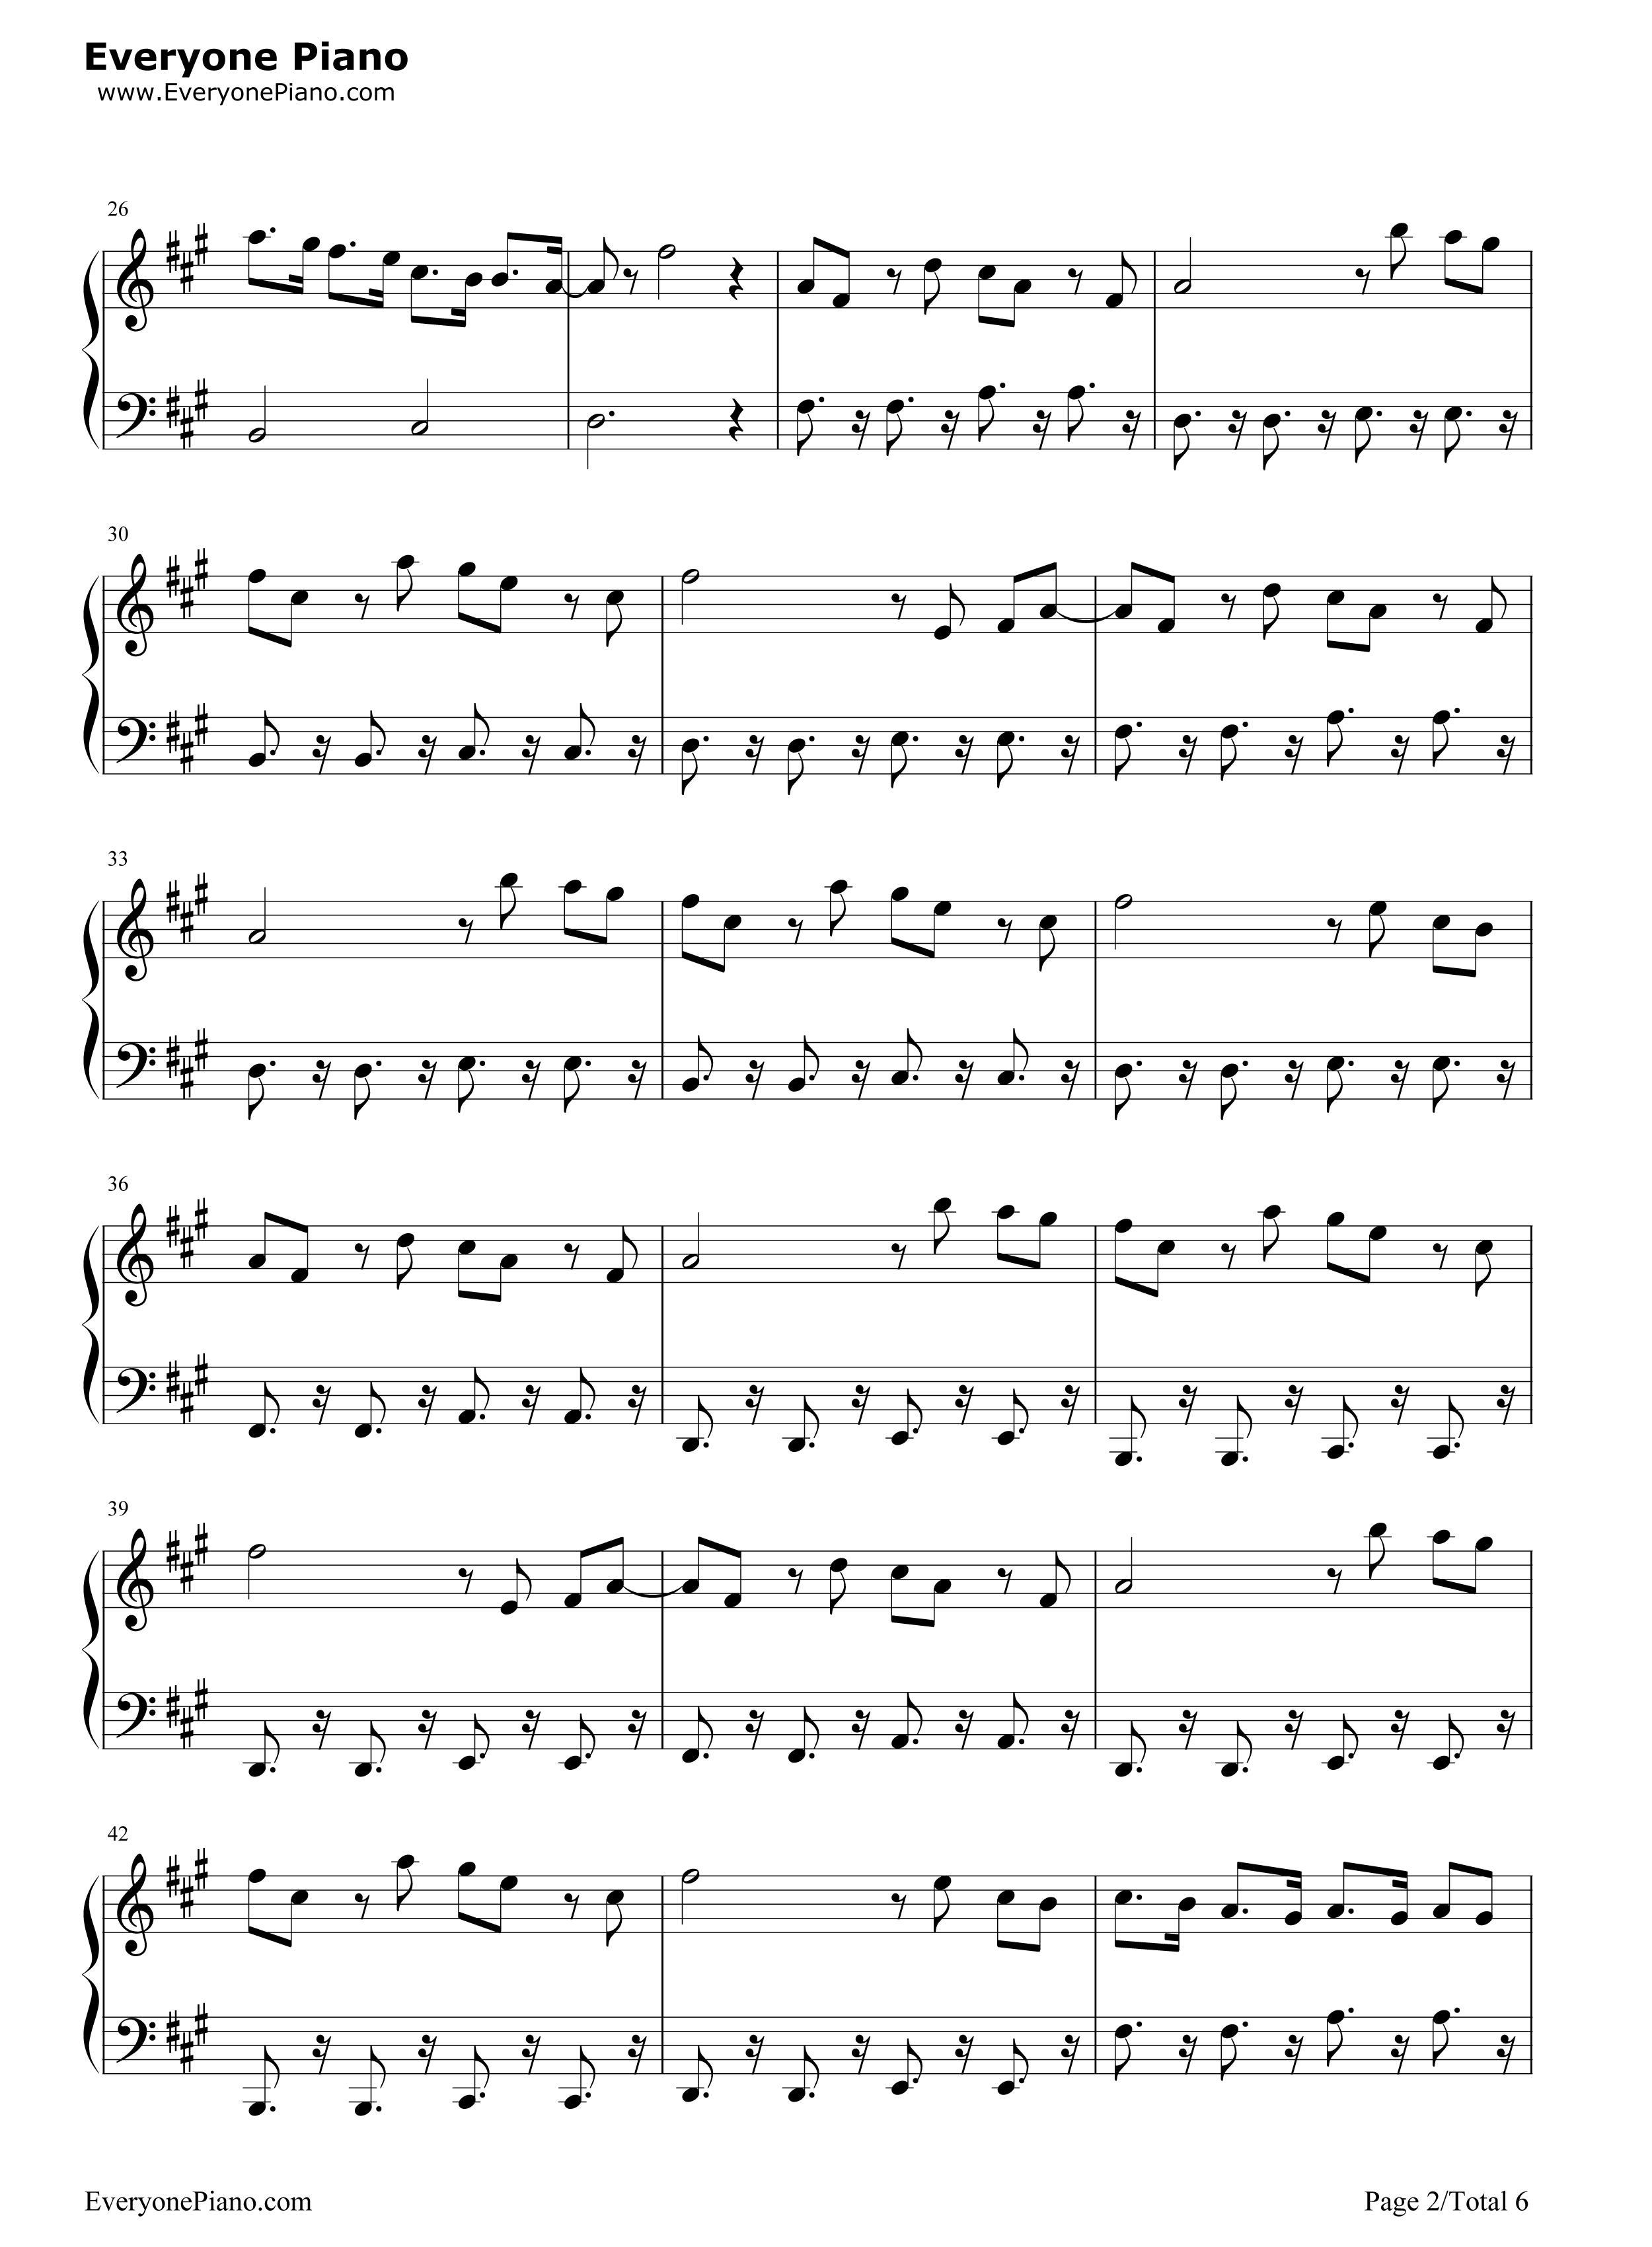 Be the One Avicii五线谱预览2 钢琴谱文件 五线谱 双手简谱 数字谱